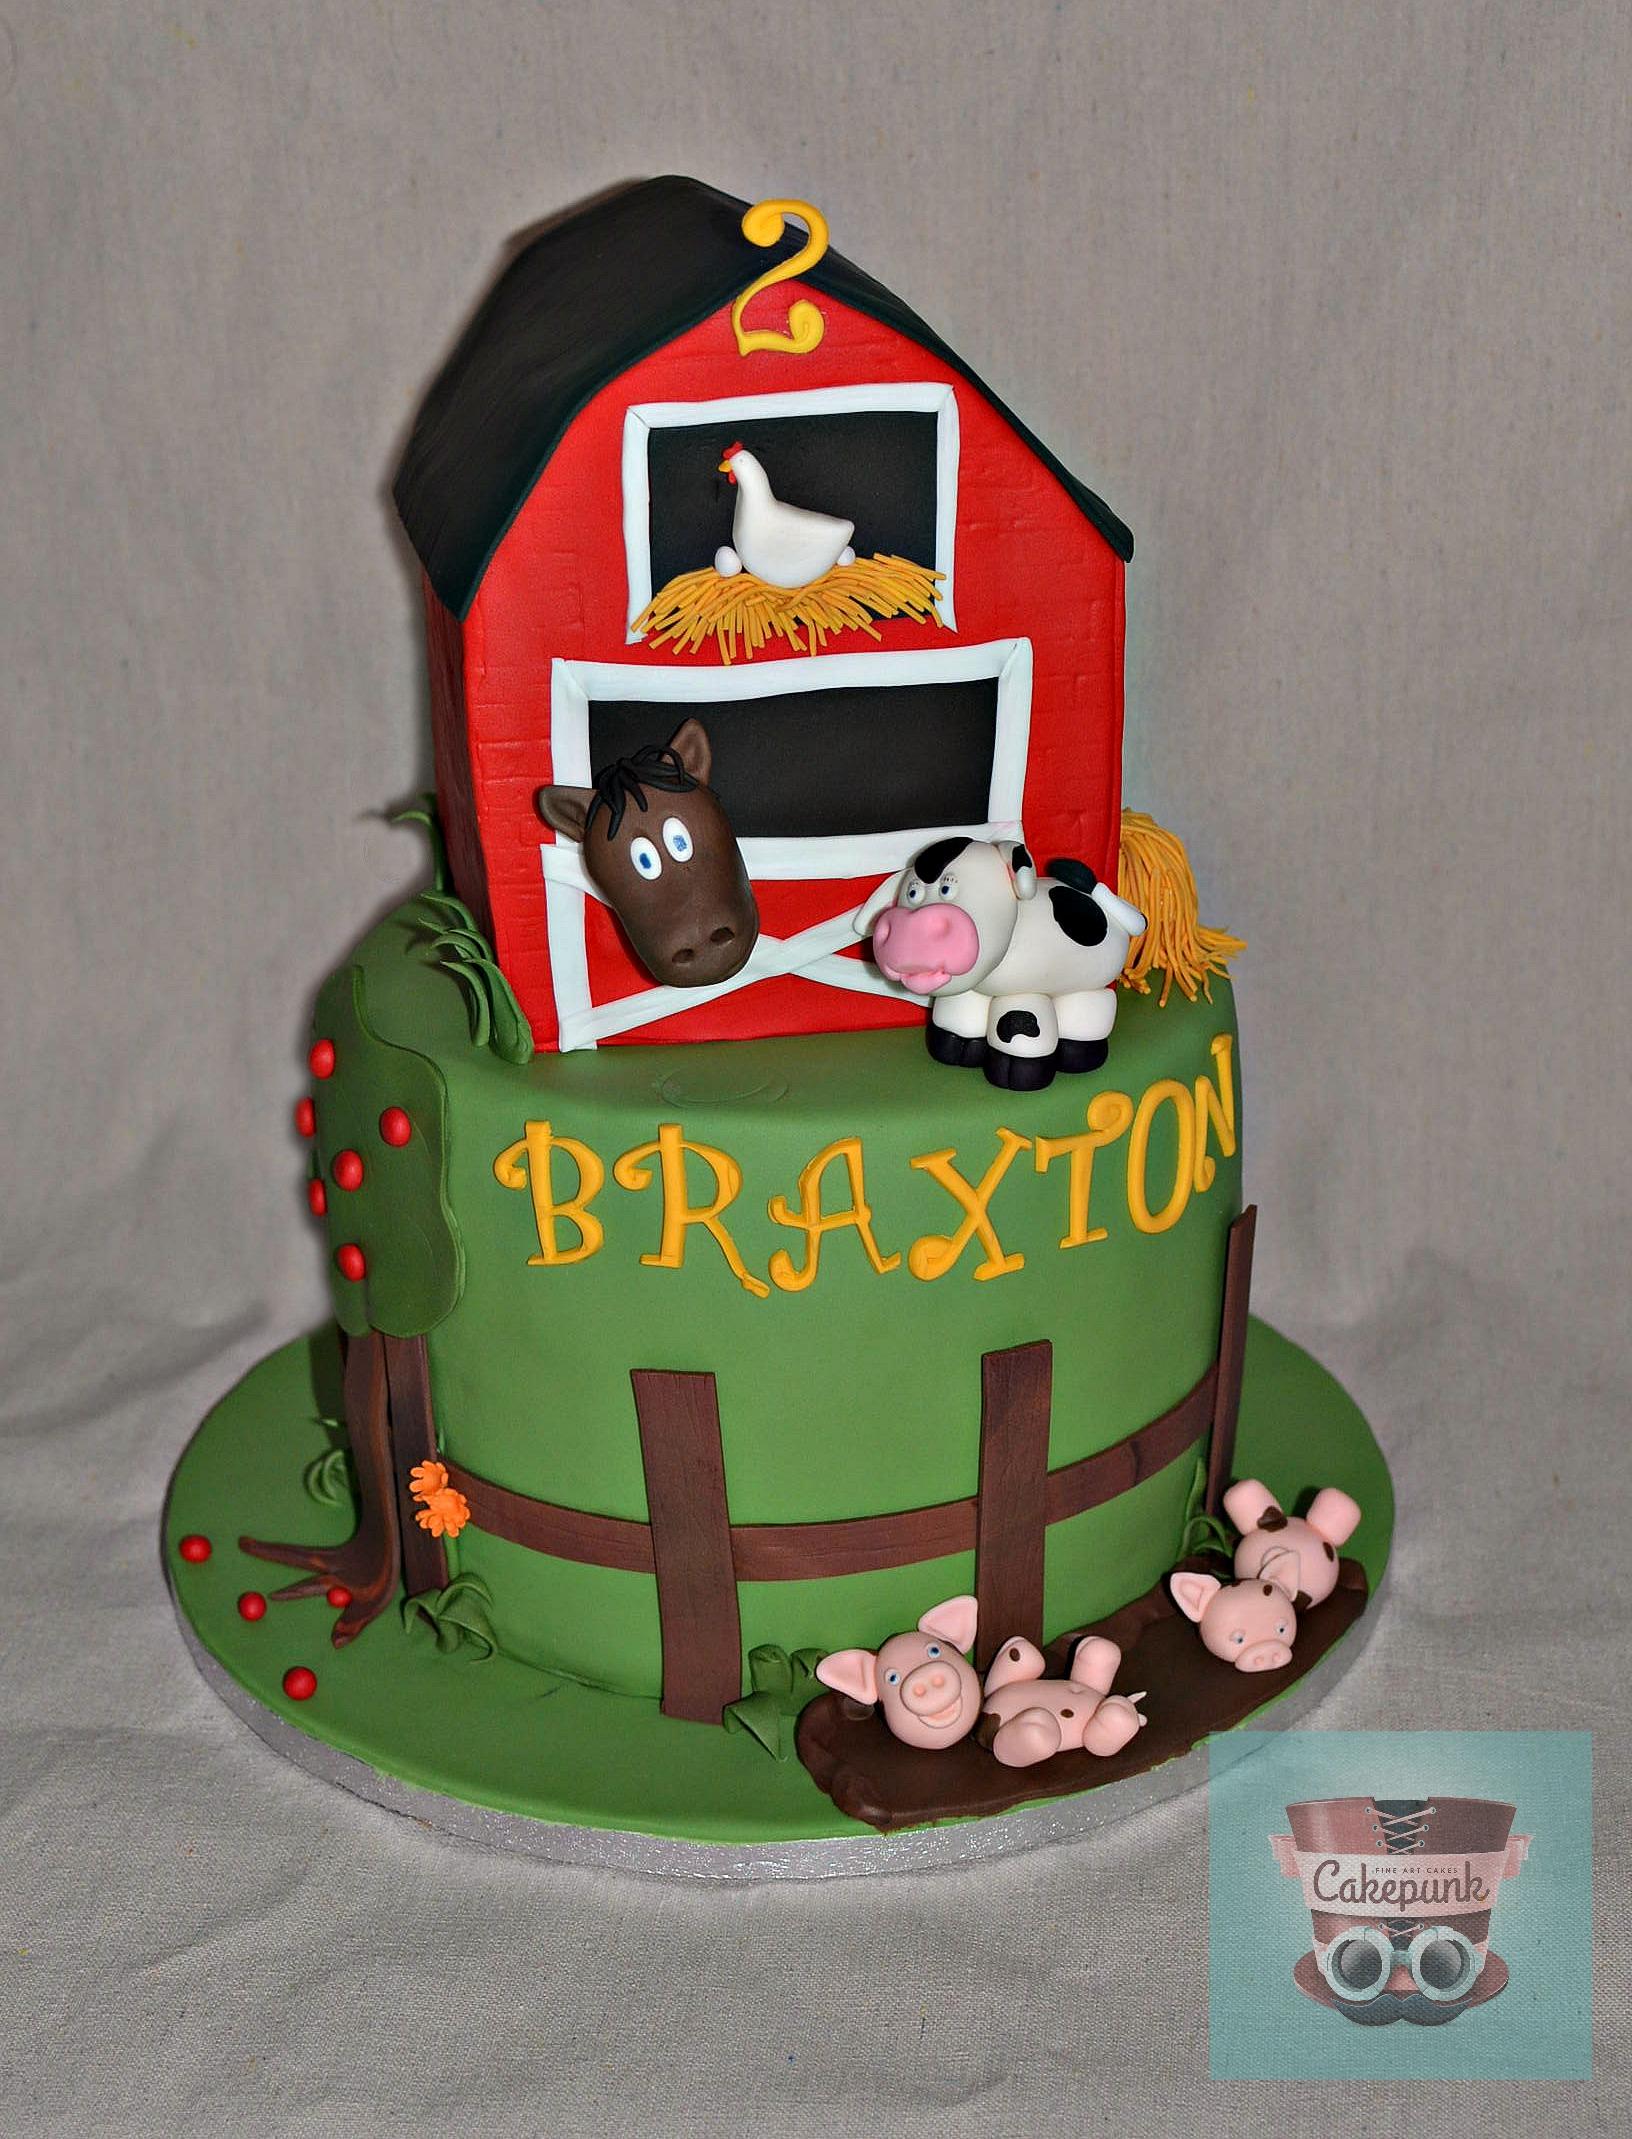 Braxton's Icing Smiles Cake